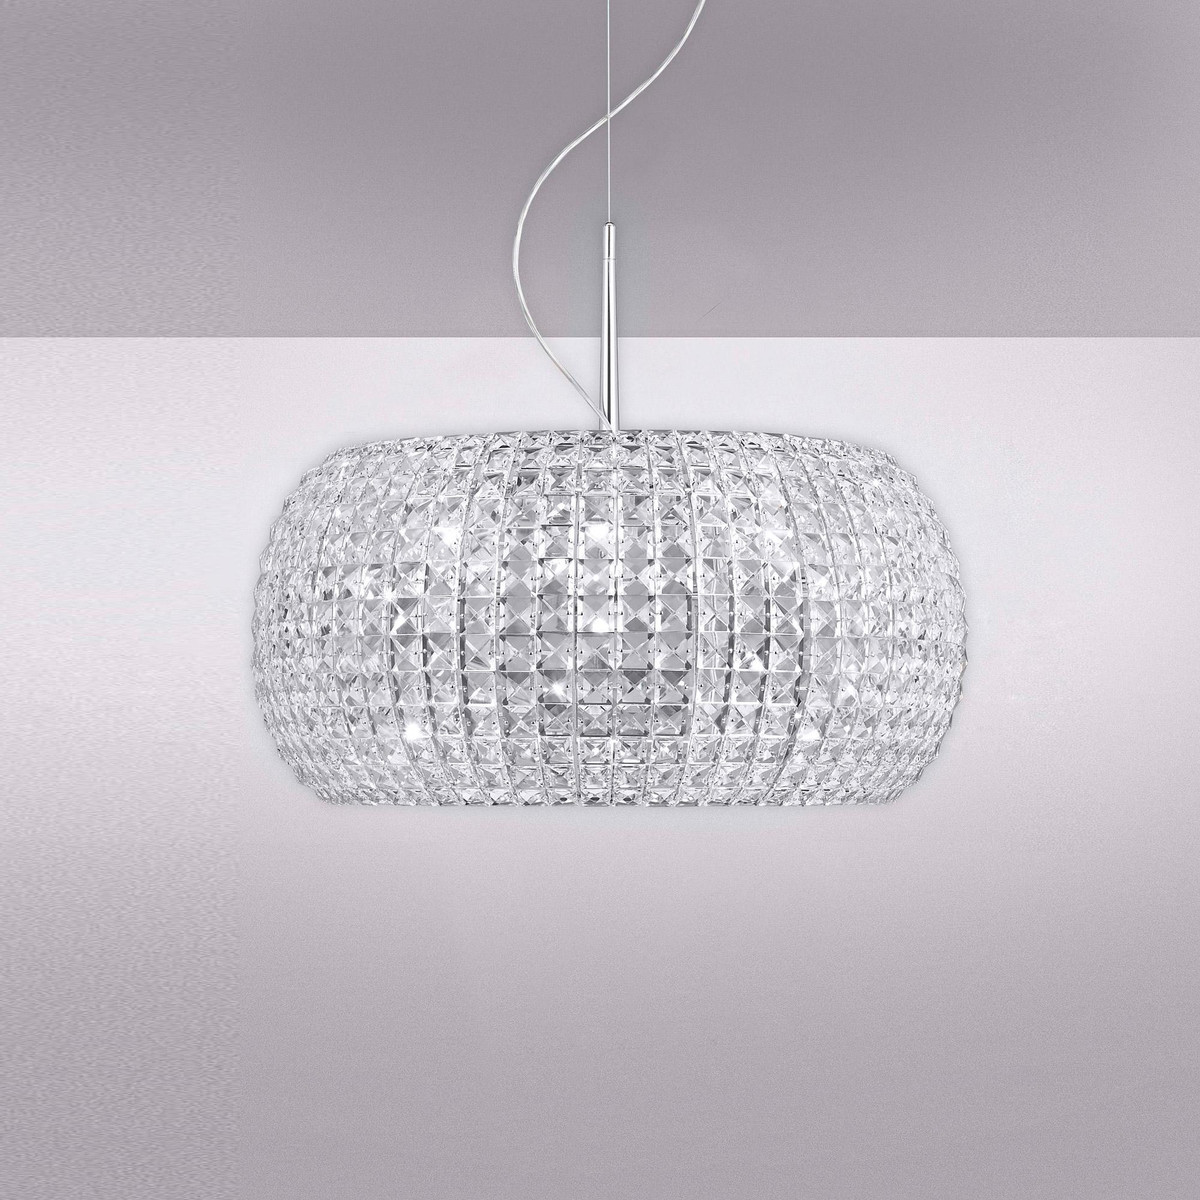 Pipe 3 led suspension lamp decor walther ambientedirect com - Marchetti Pulsar Suspension Lamp